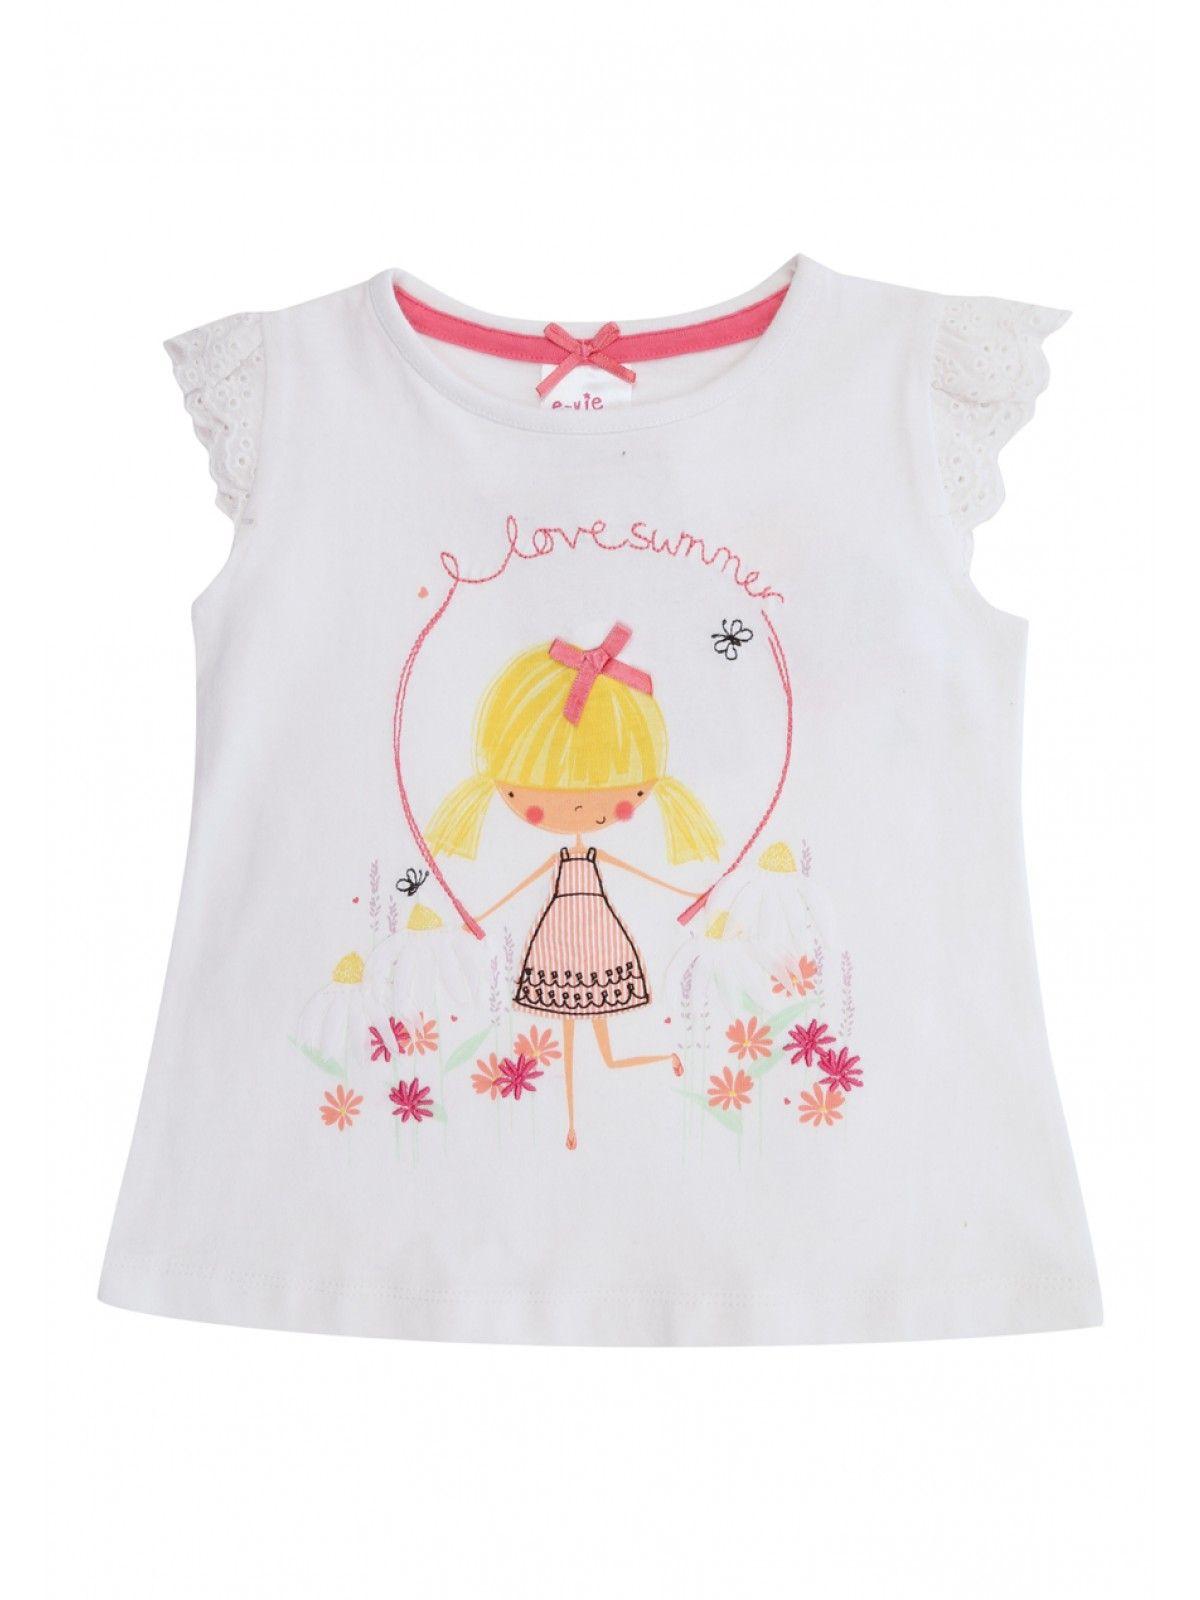 Cute Pink Hair Princess Girl Women/'s Tee Image by Shutterstock